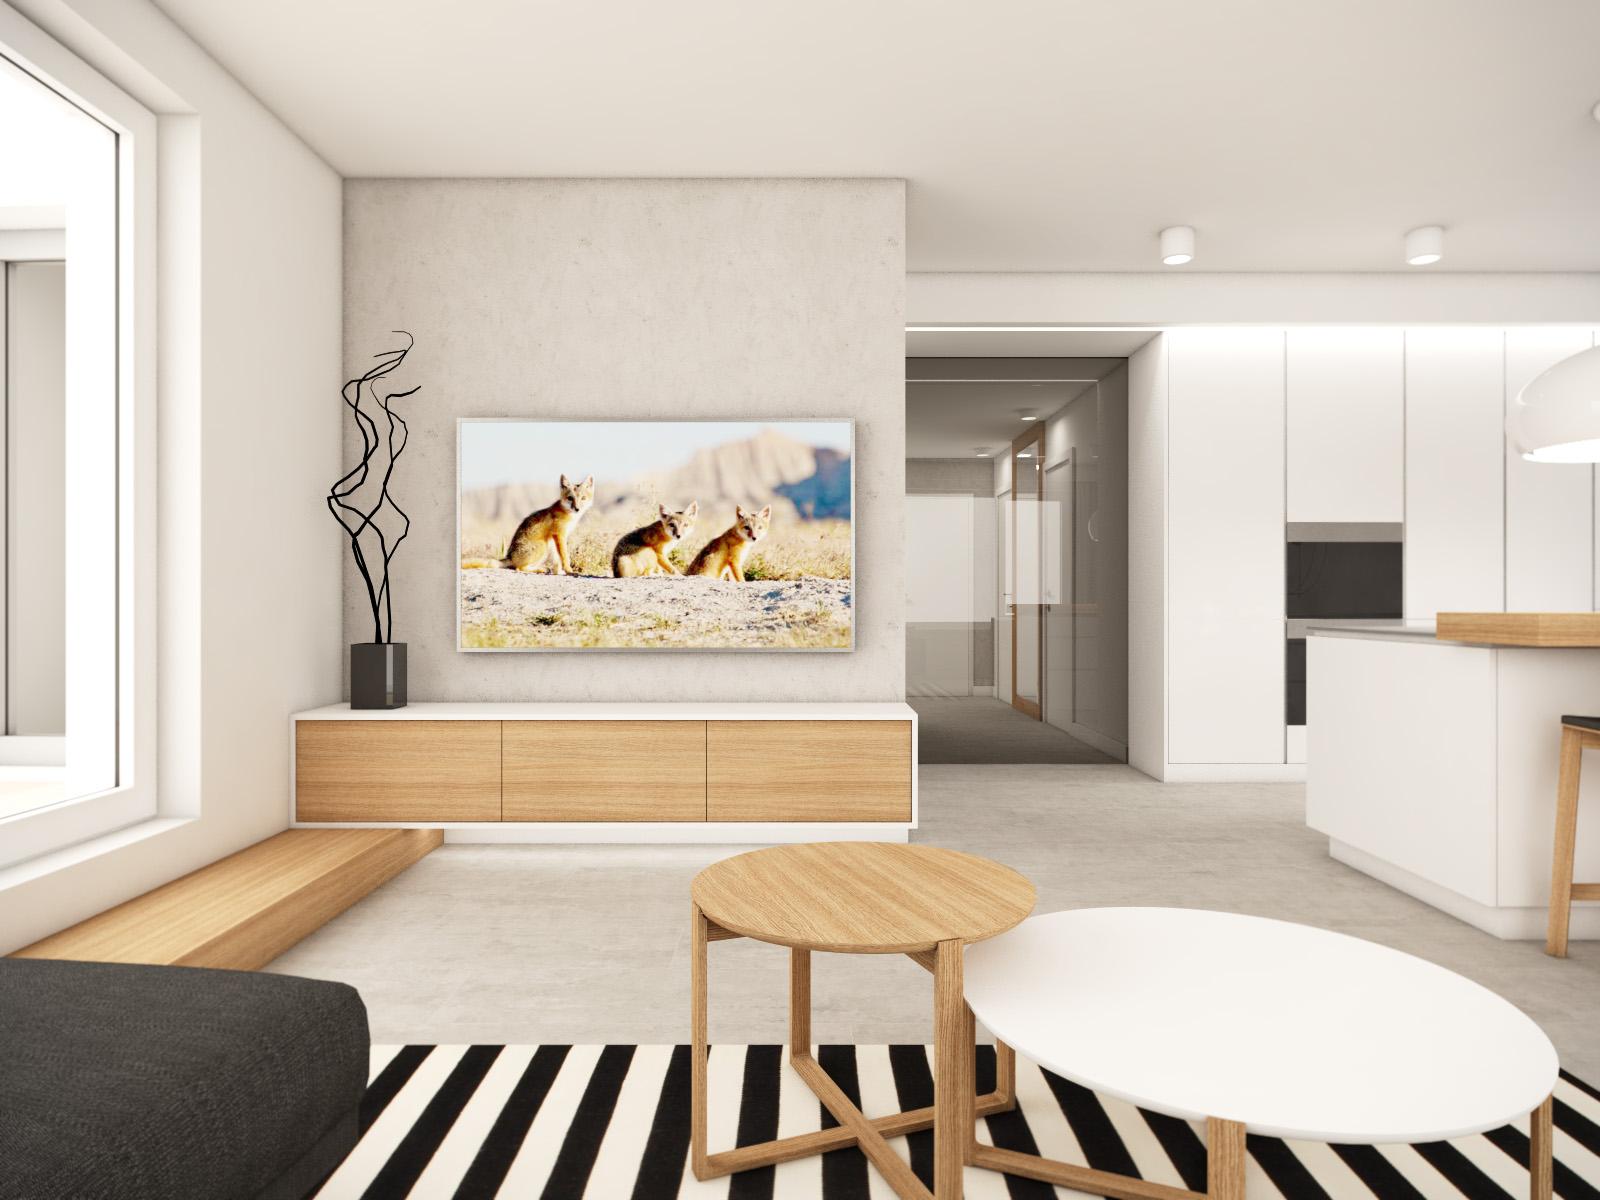 Štartovací byt | design CADFACE